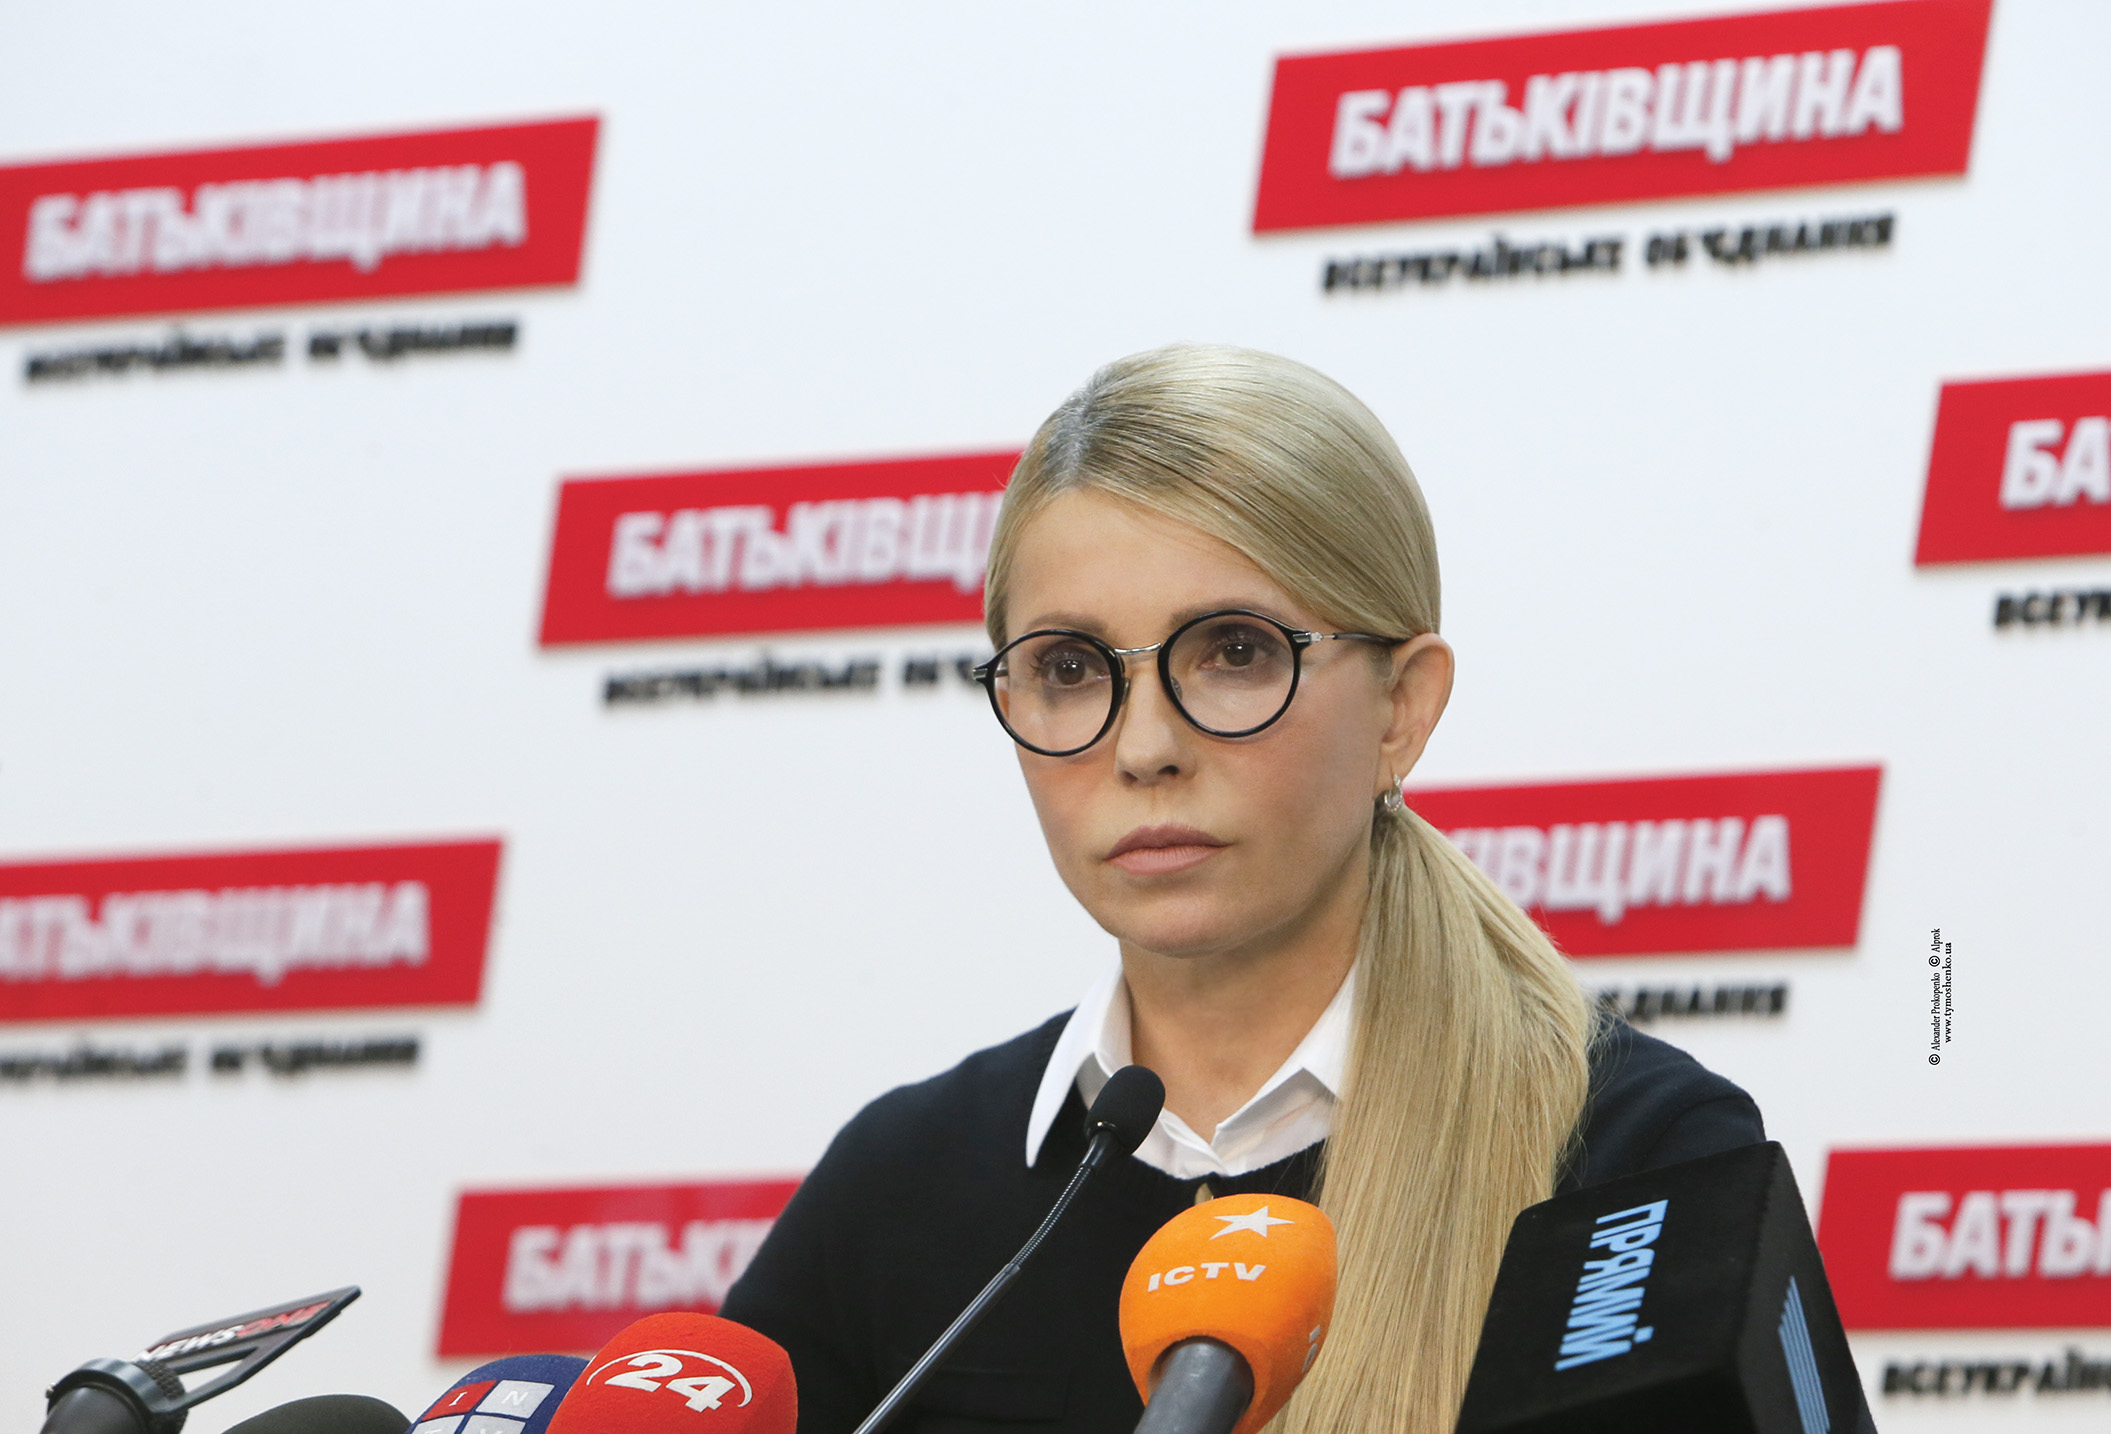 Crimea - Ukraine News. Friday 28 September. [Ukrainian sources] C6263574bb8a2ae882ee5e018224c76d